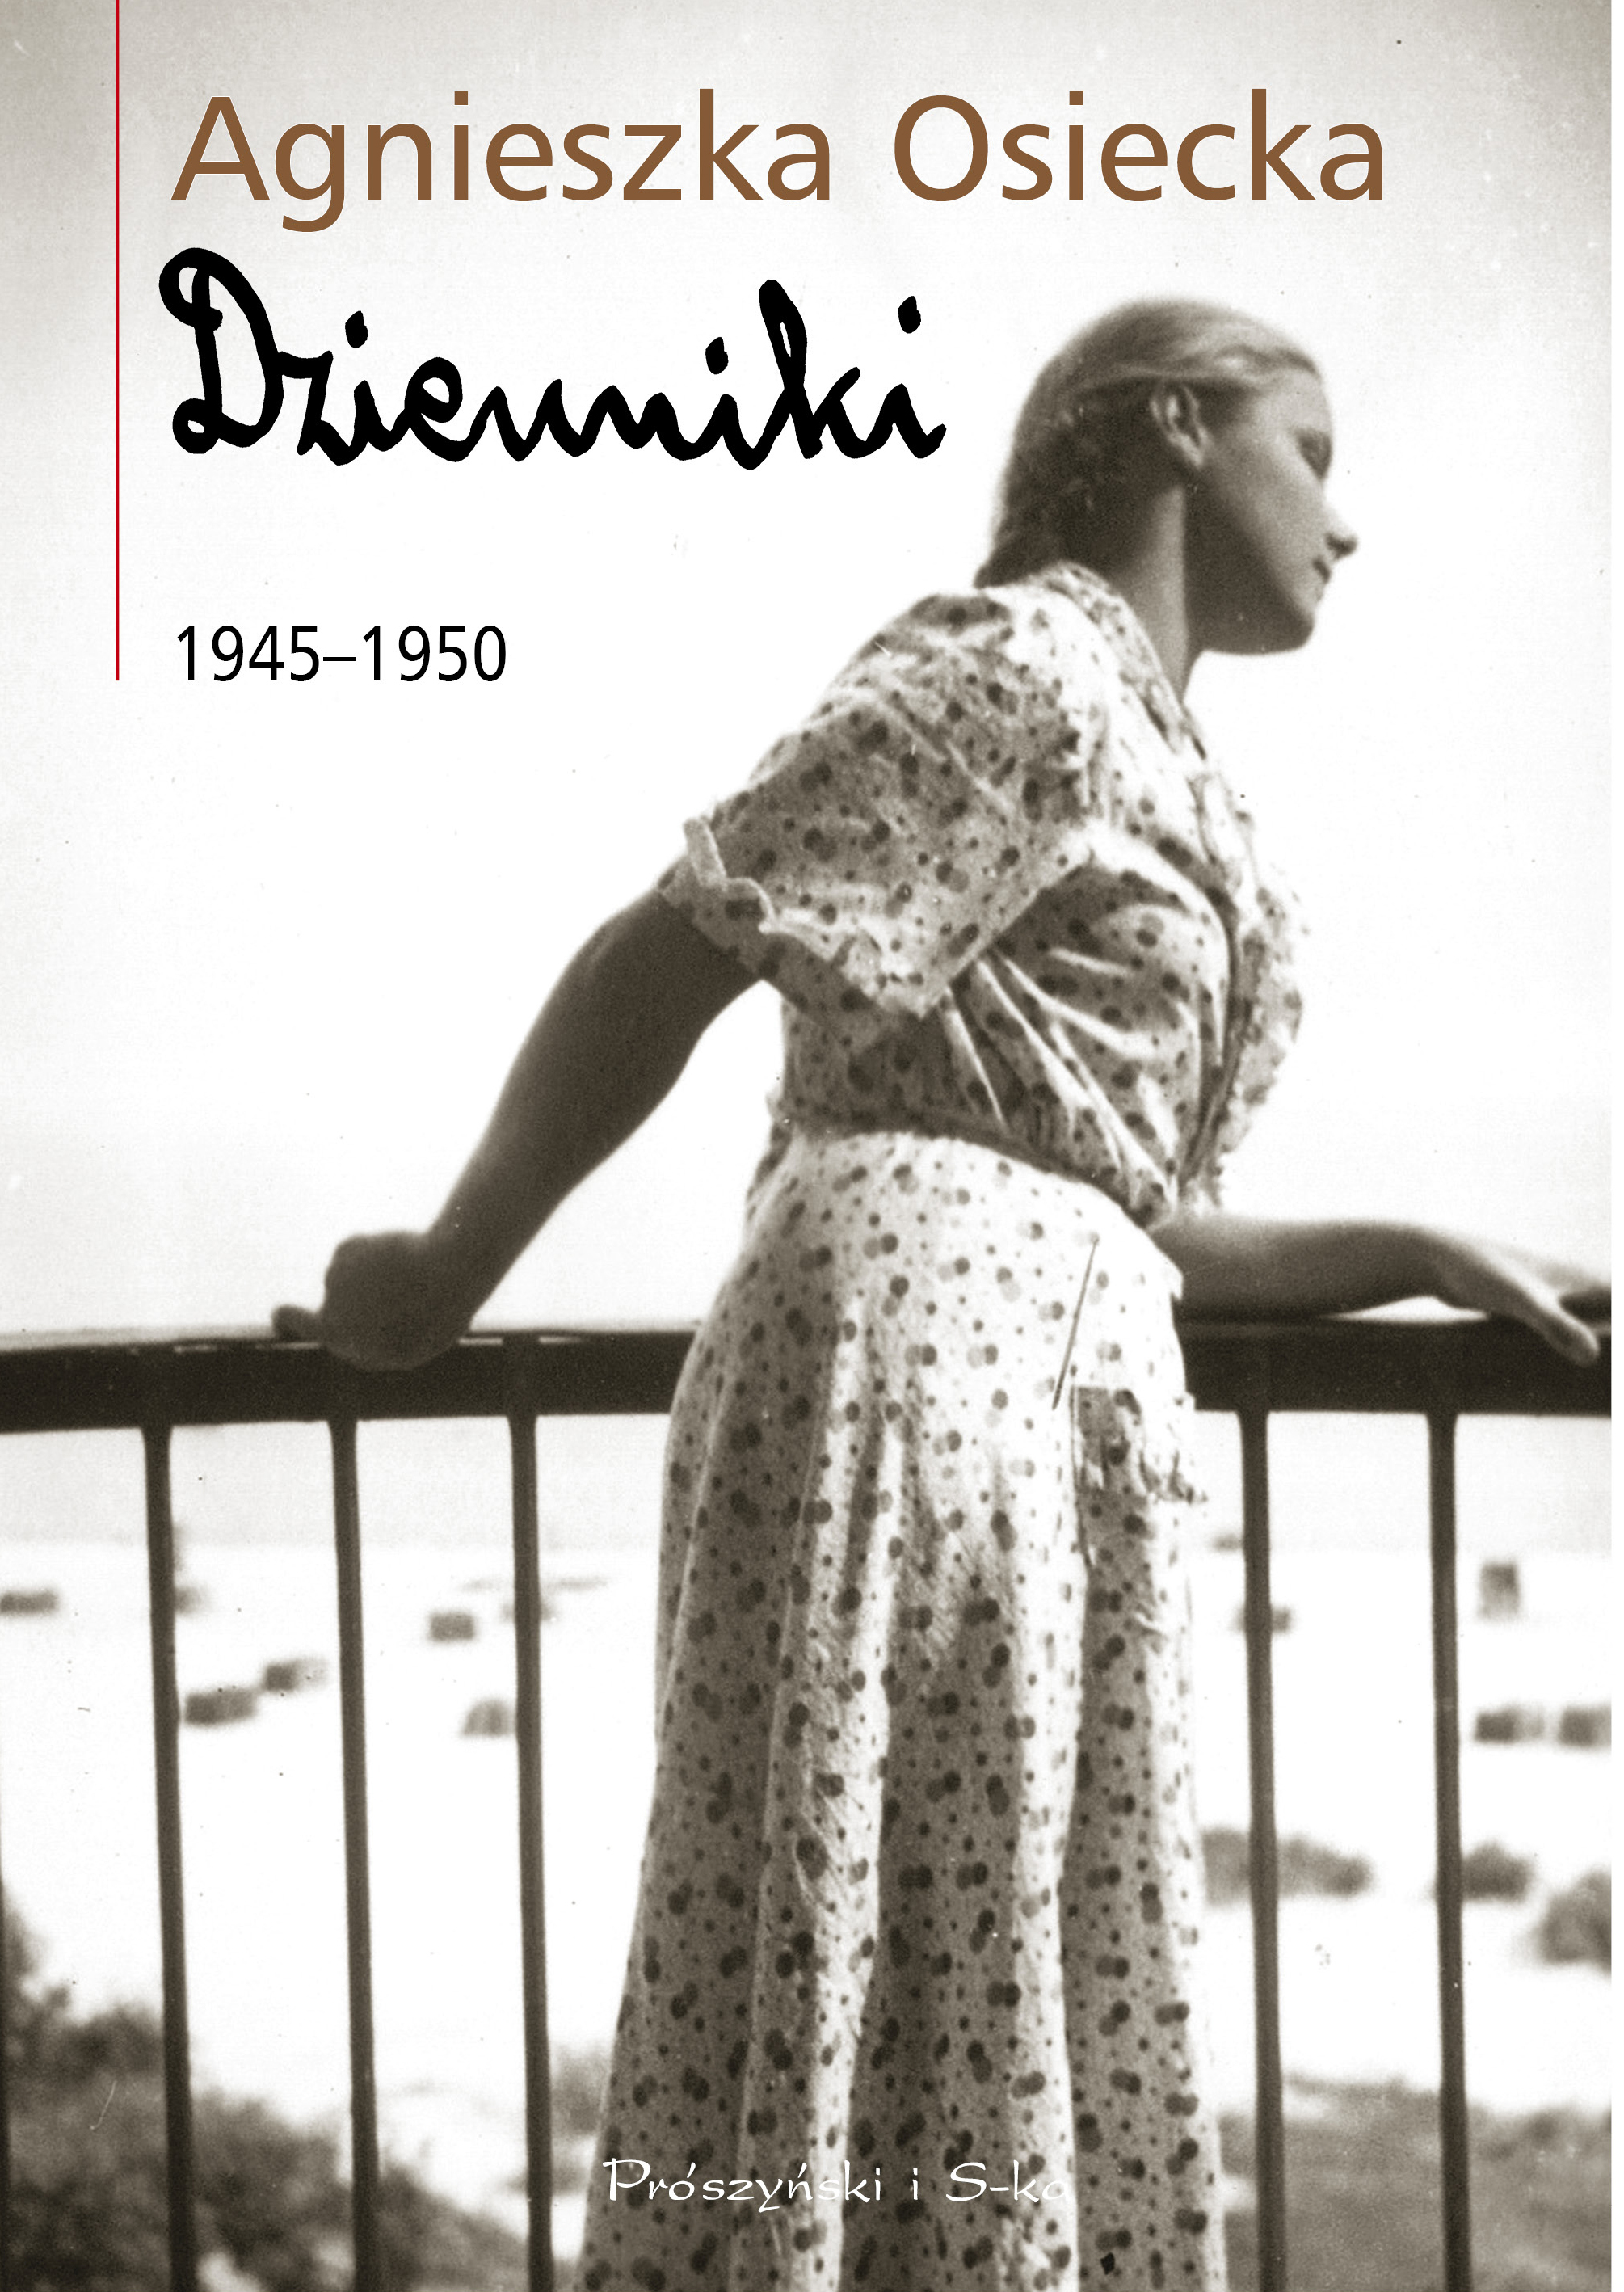 Agnieszka Osiecka Dzienniki 1945-1950 t.1